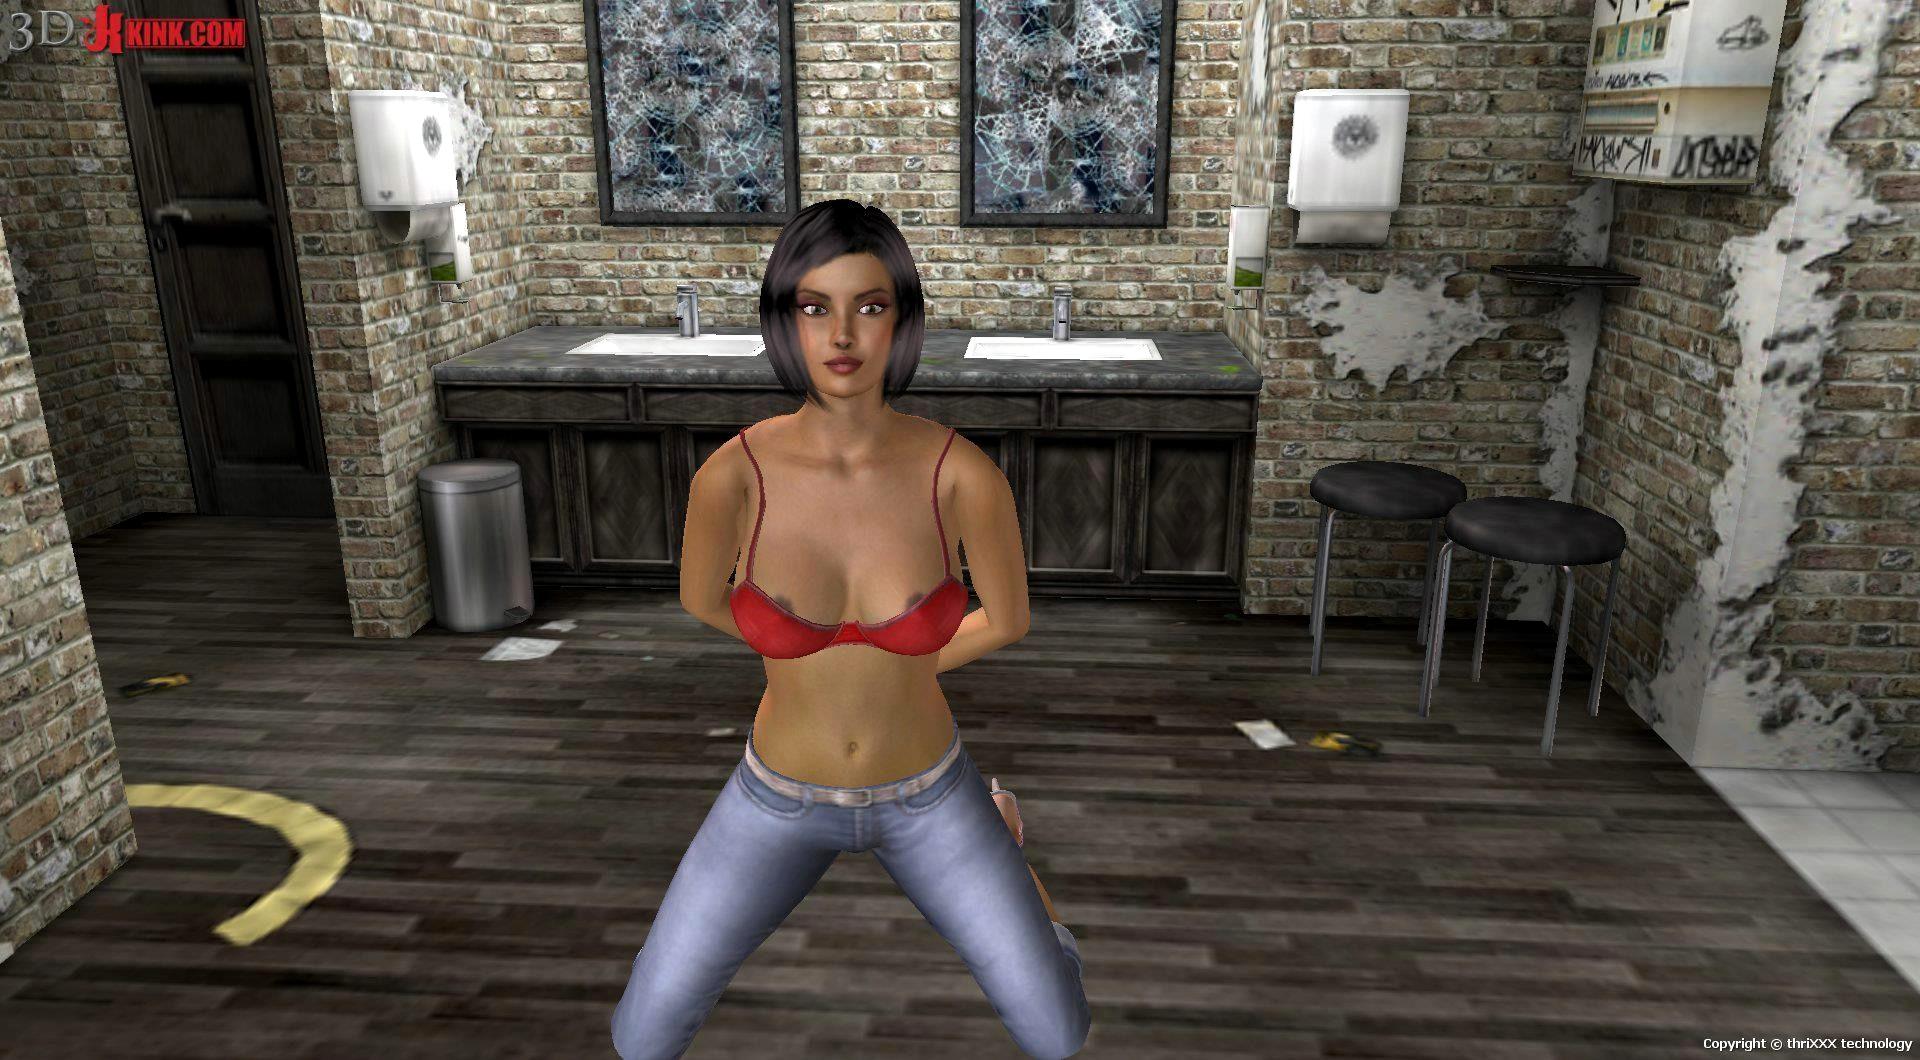 Mobile Porn Kink